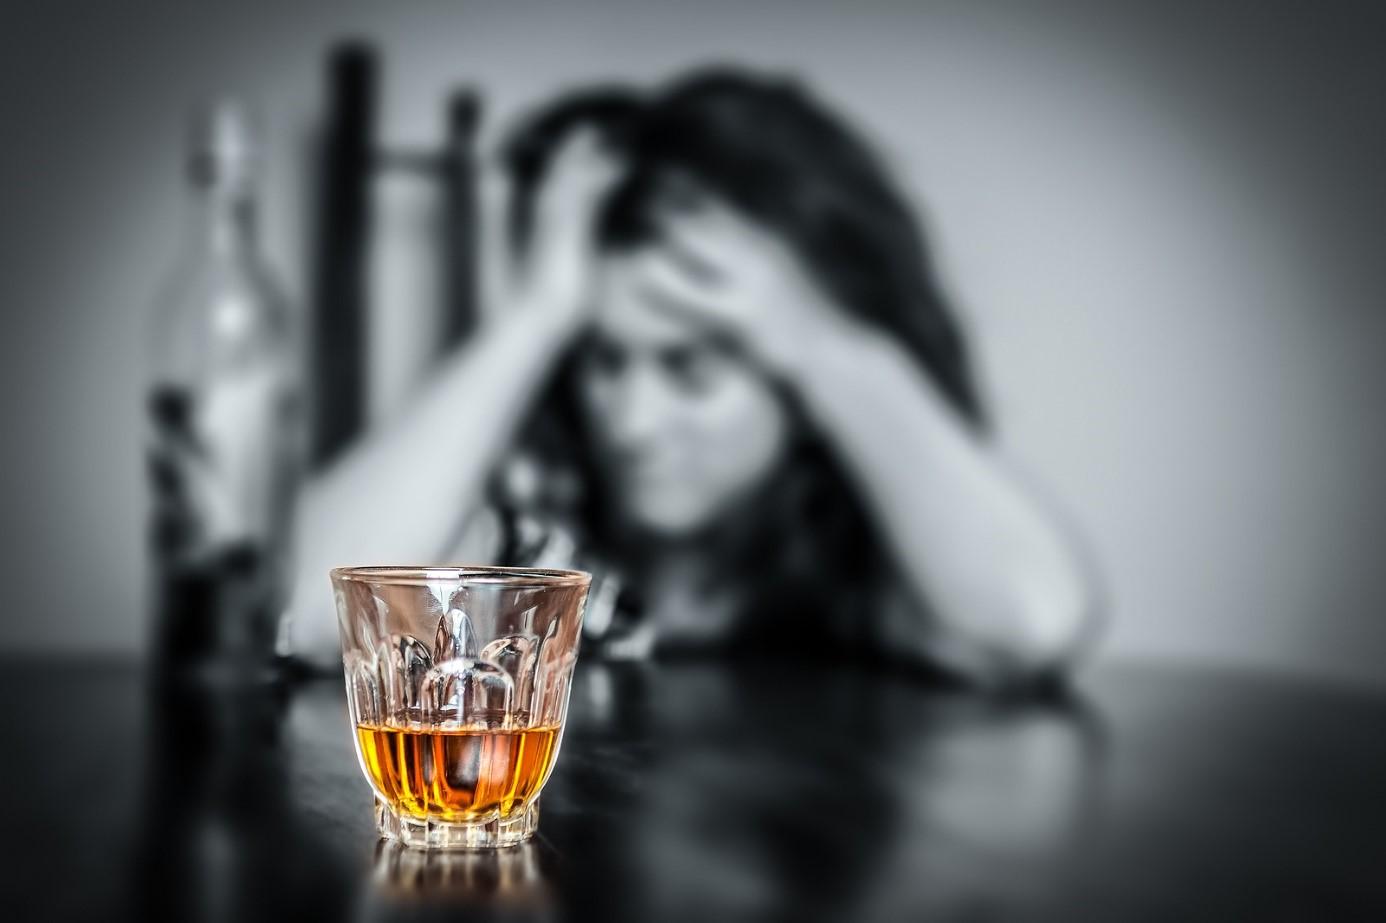 Benarkah Pecandu Narkoba Berisiko Tinggi Alami Gangguan Jiwa